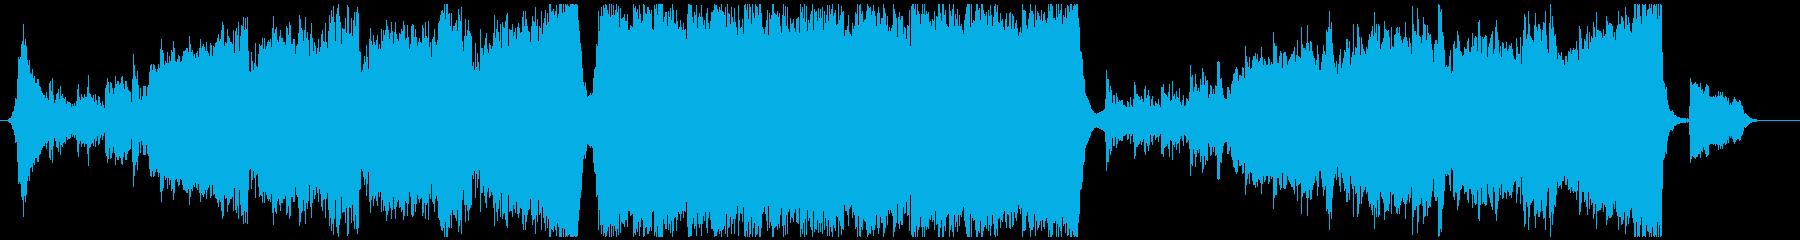 Enthusiasmの再生済みの波形